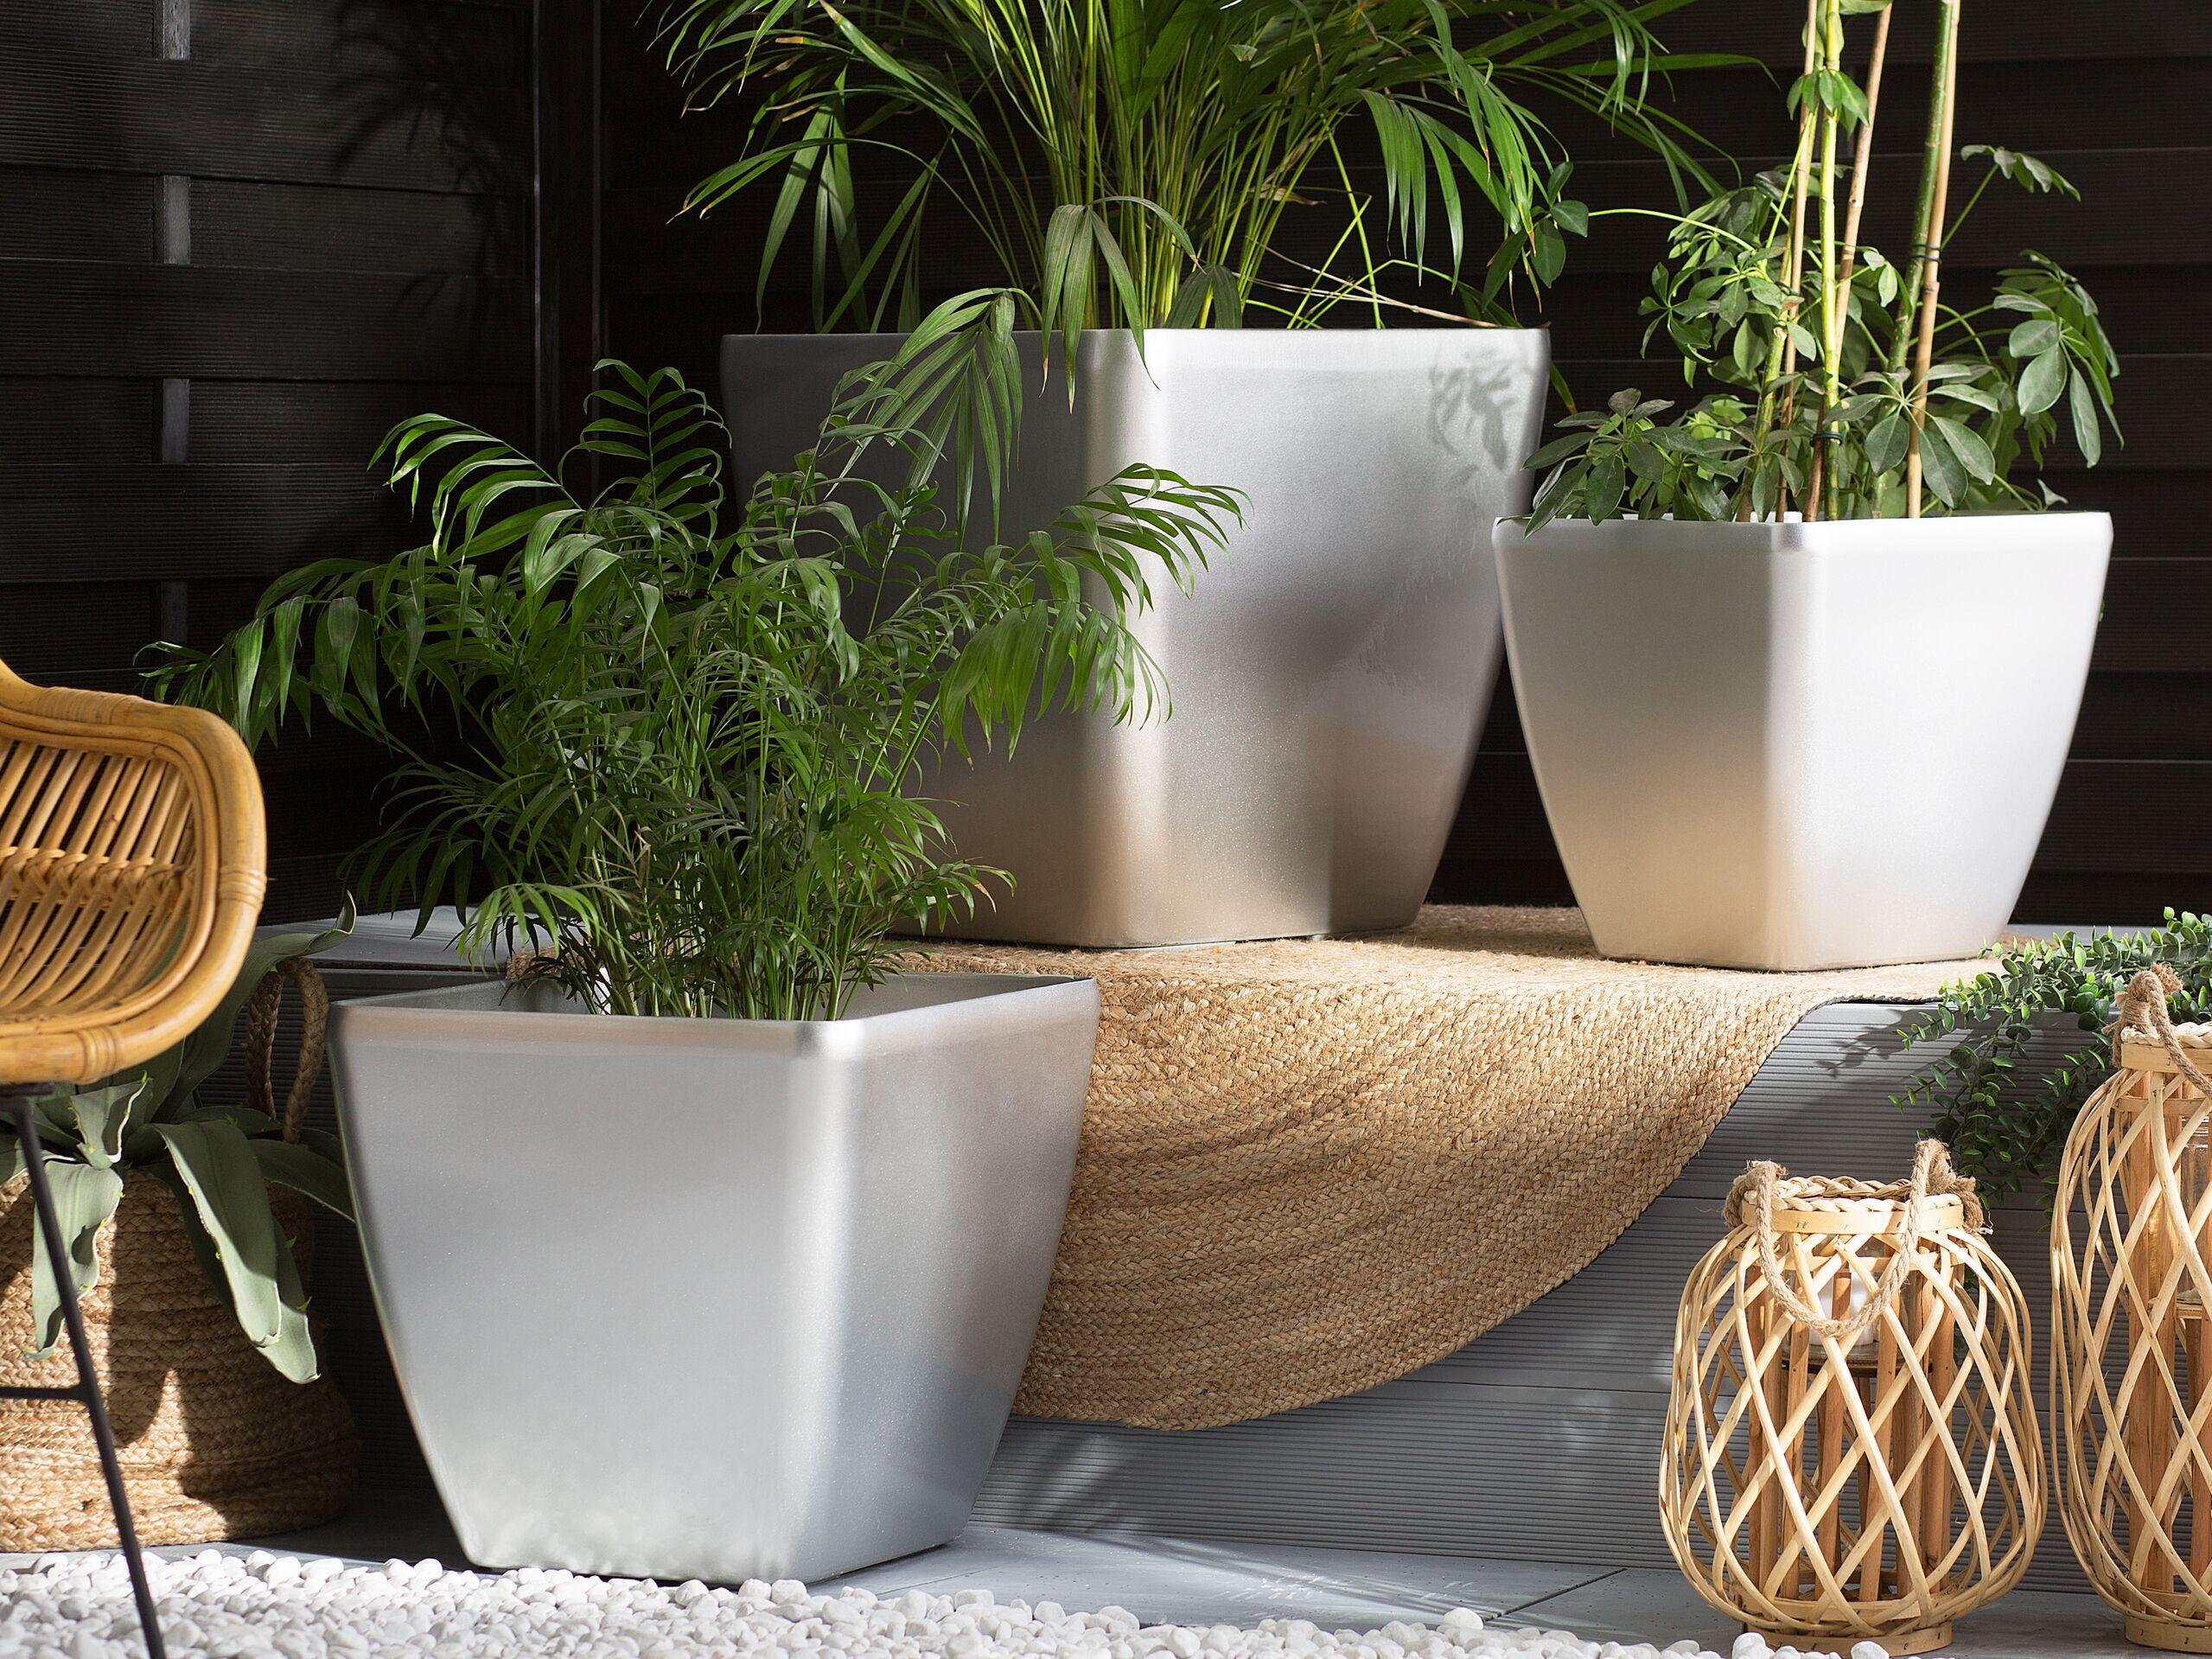 beliani set di 3 vasi per piante argilla sintetica argentata esterni o interni